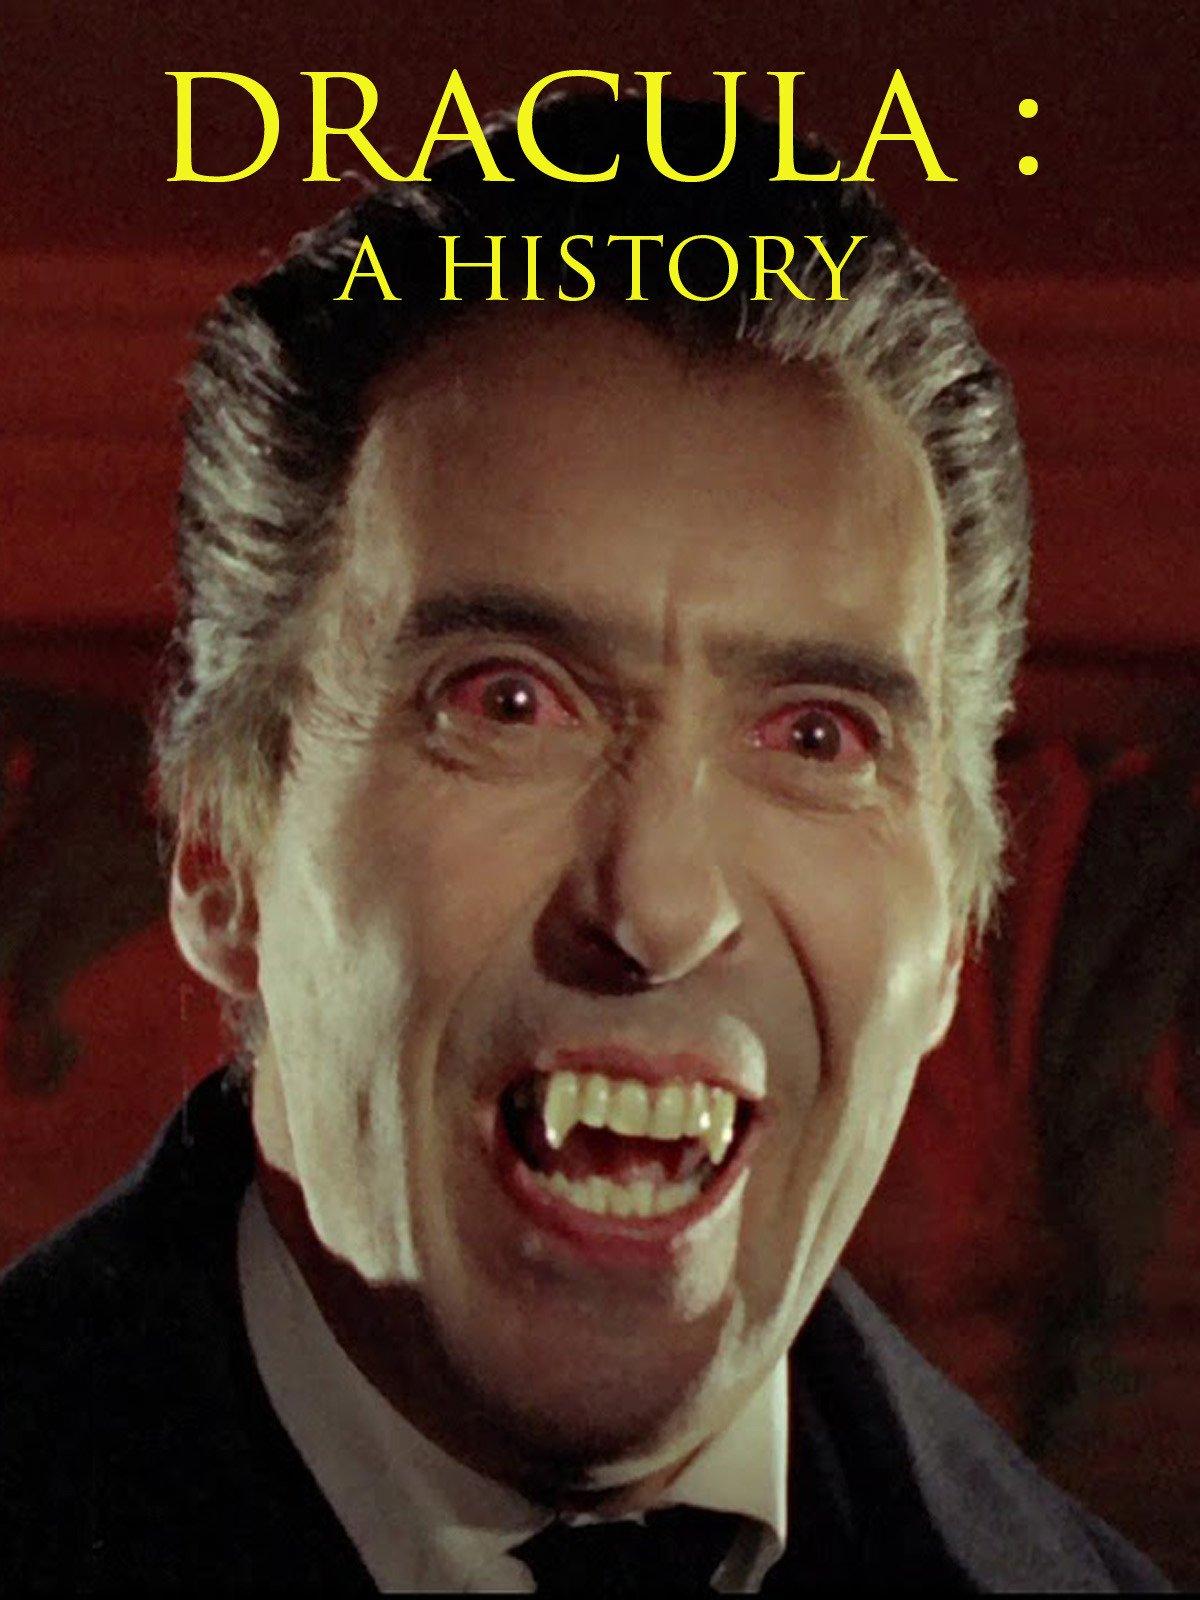 Dracula : A History